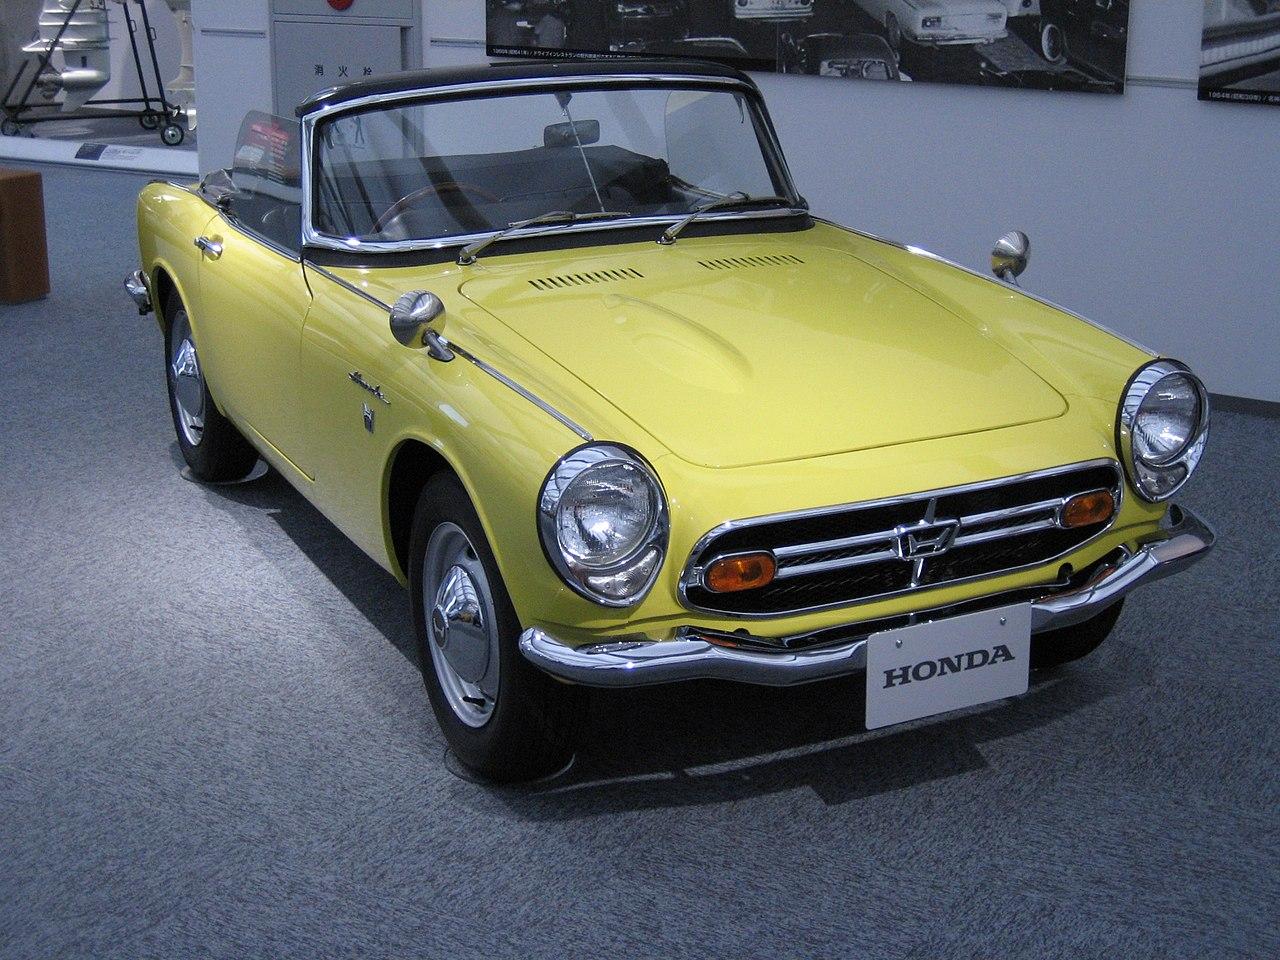 1280px-HondaS800.JPG